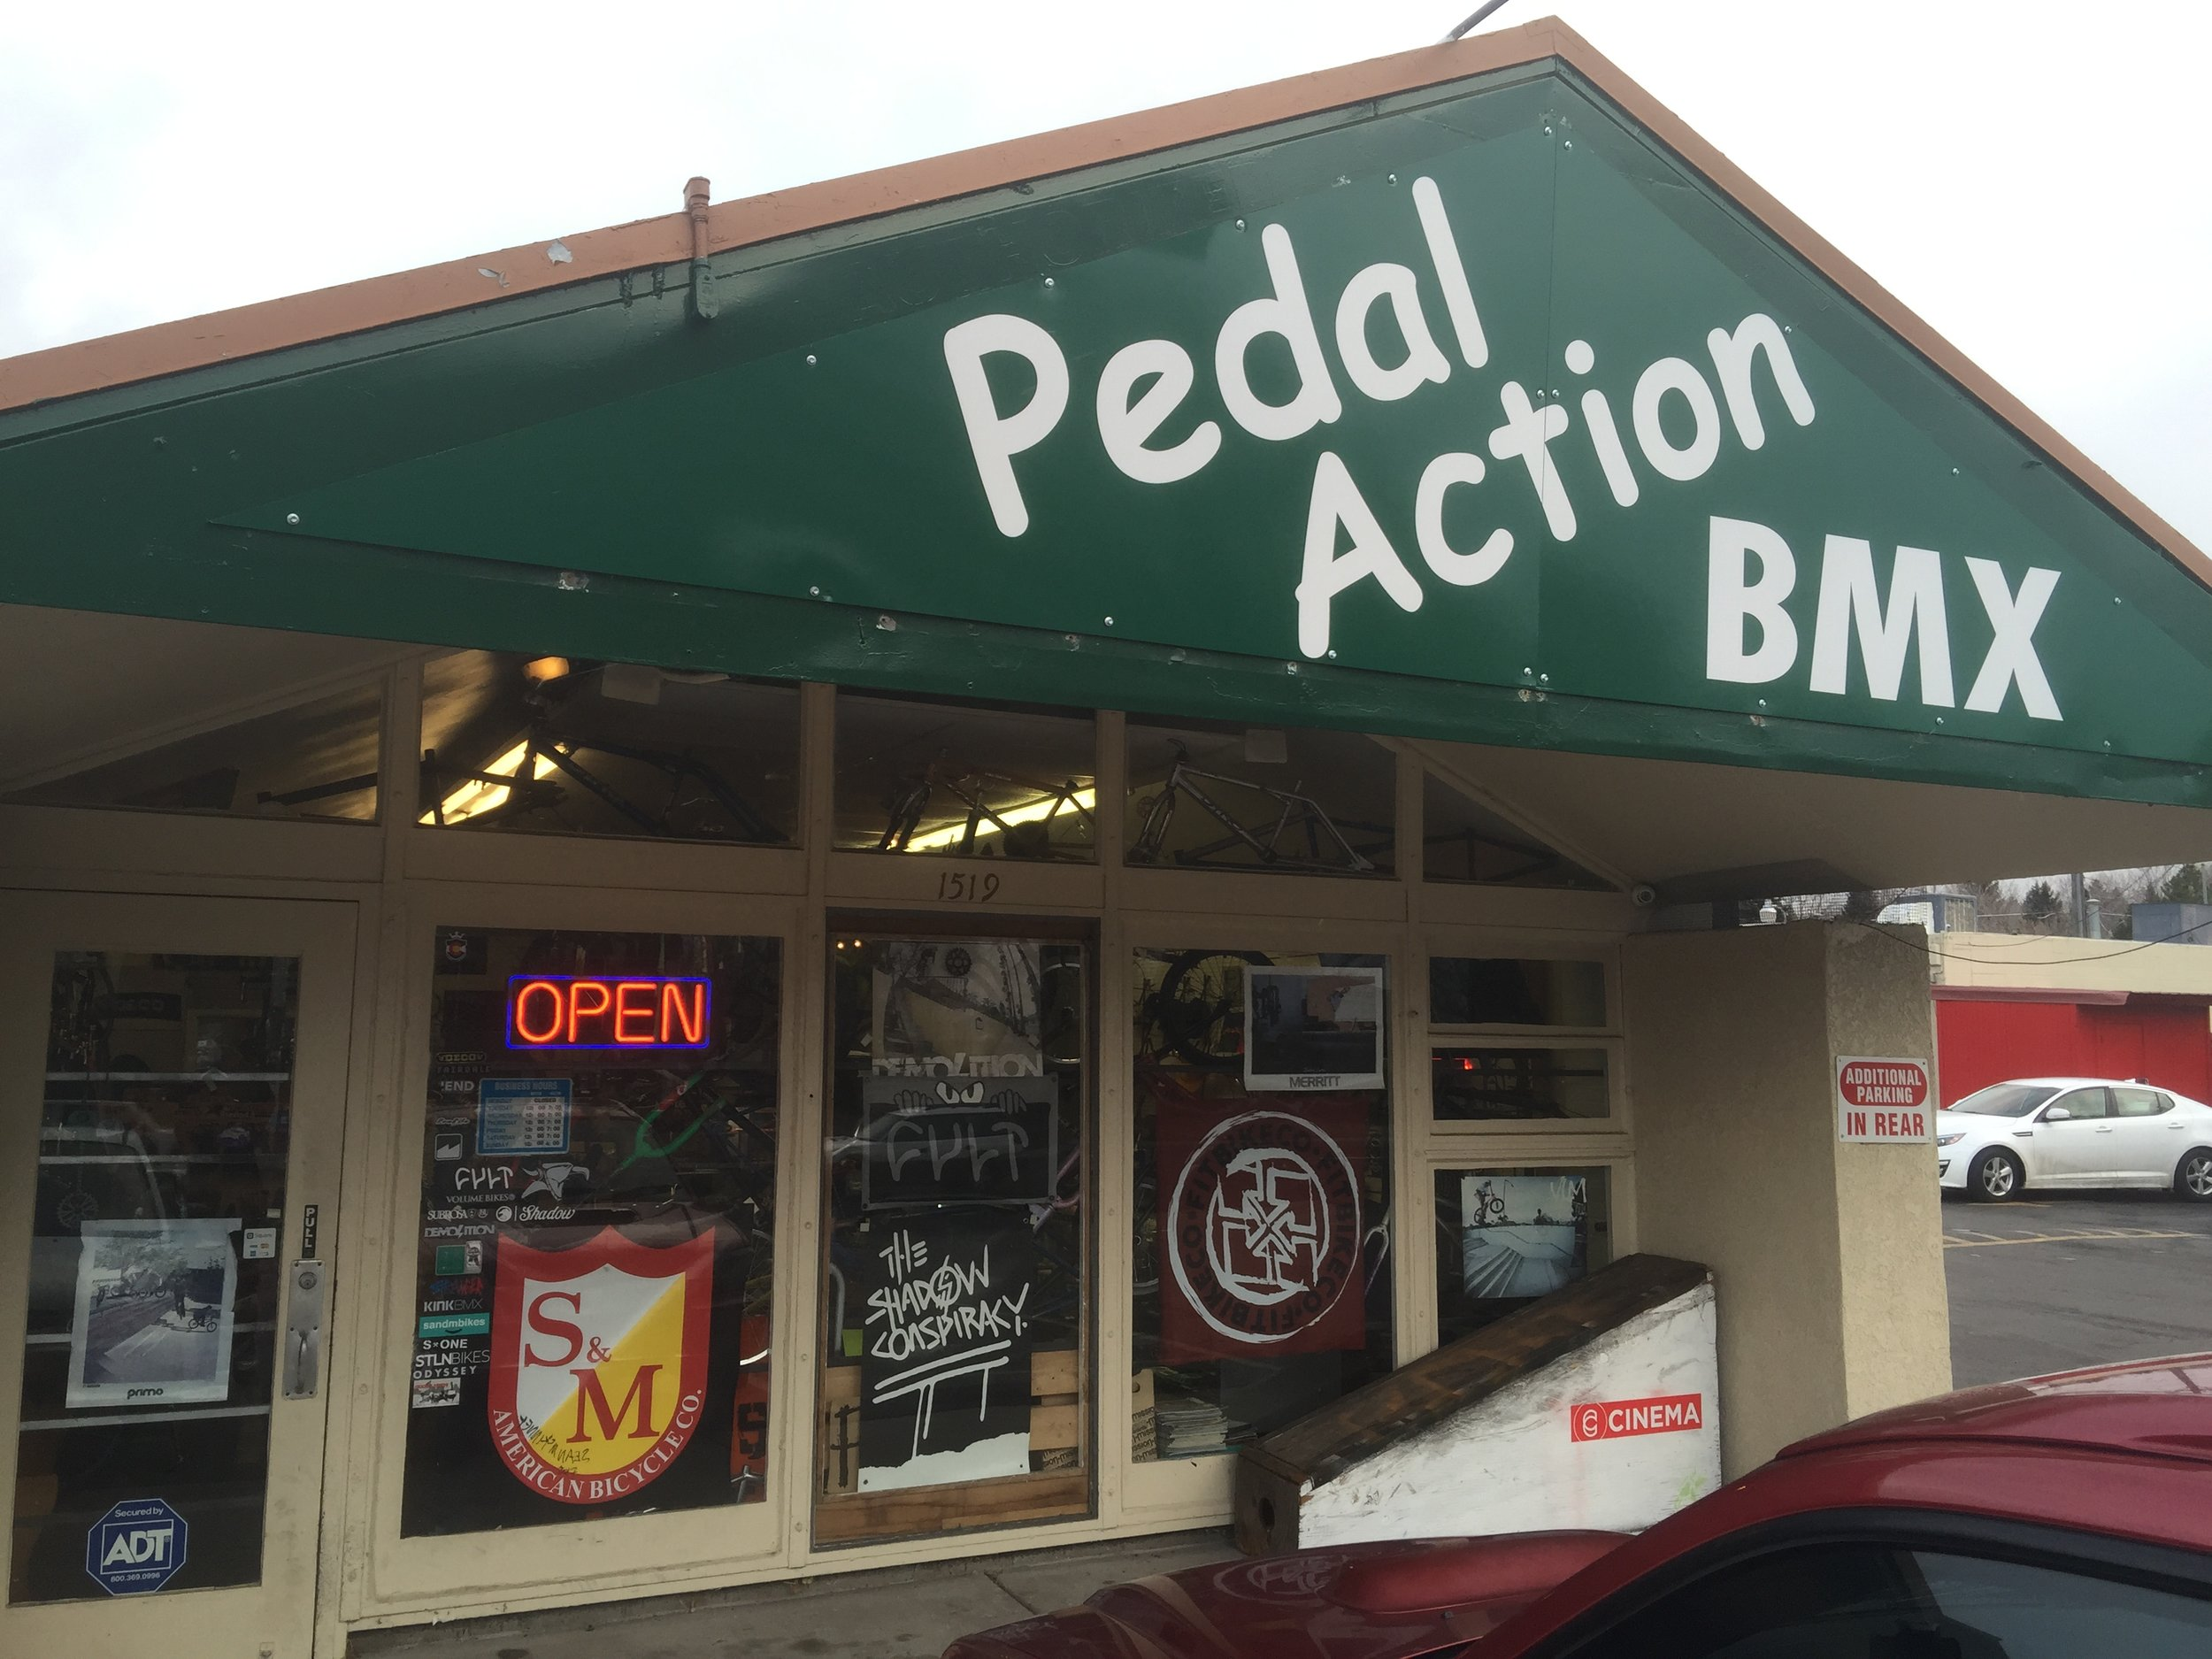 PEDAL ACTION BMX - 1519 N. Unión Blvd.Colorado Springs, 80916(719) 634 7972pedalactionbmx@gmail.com